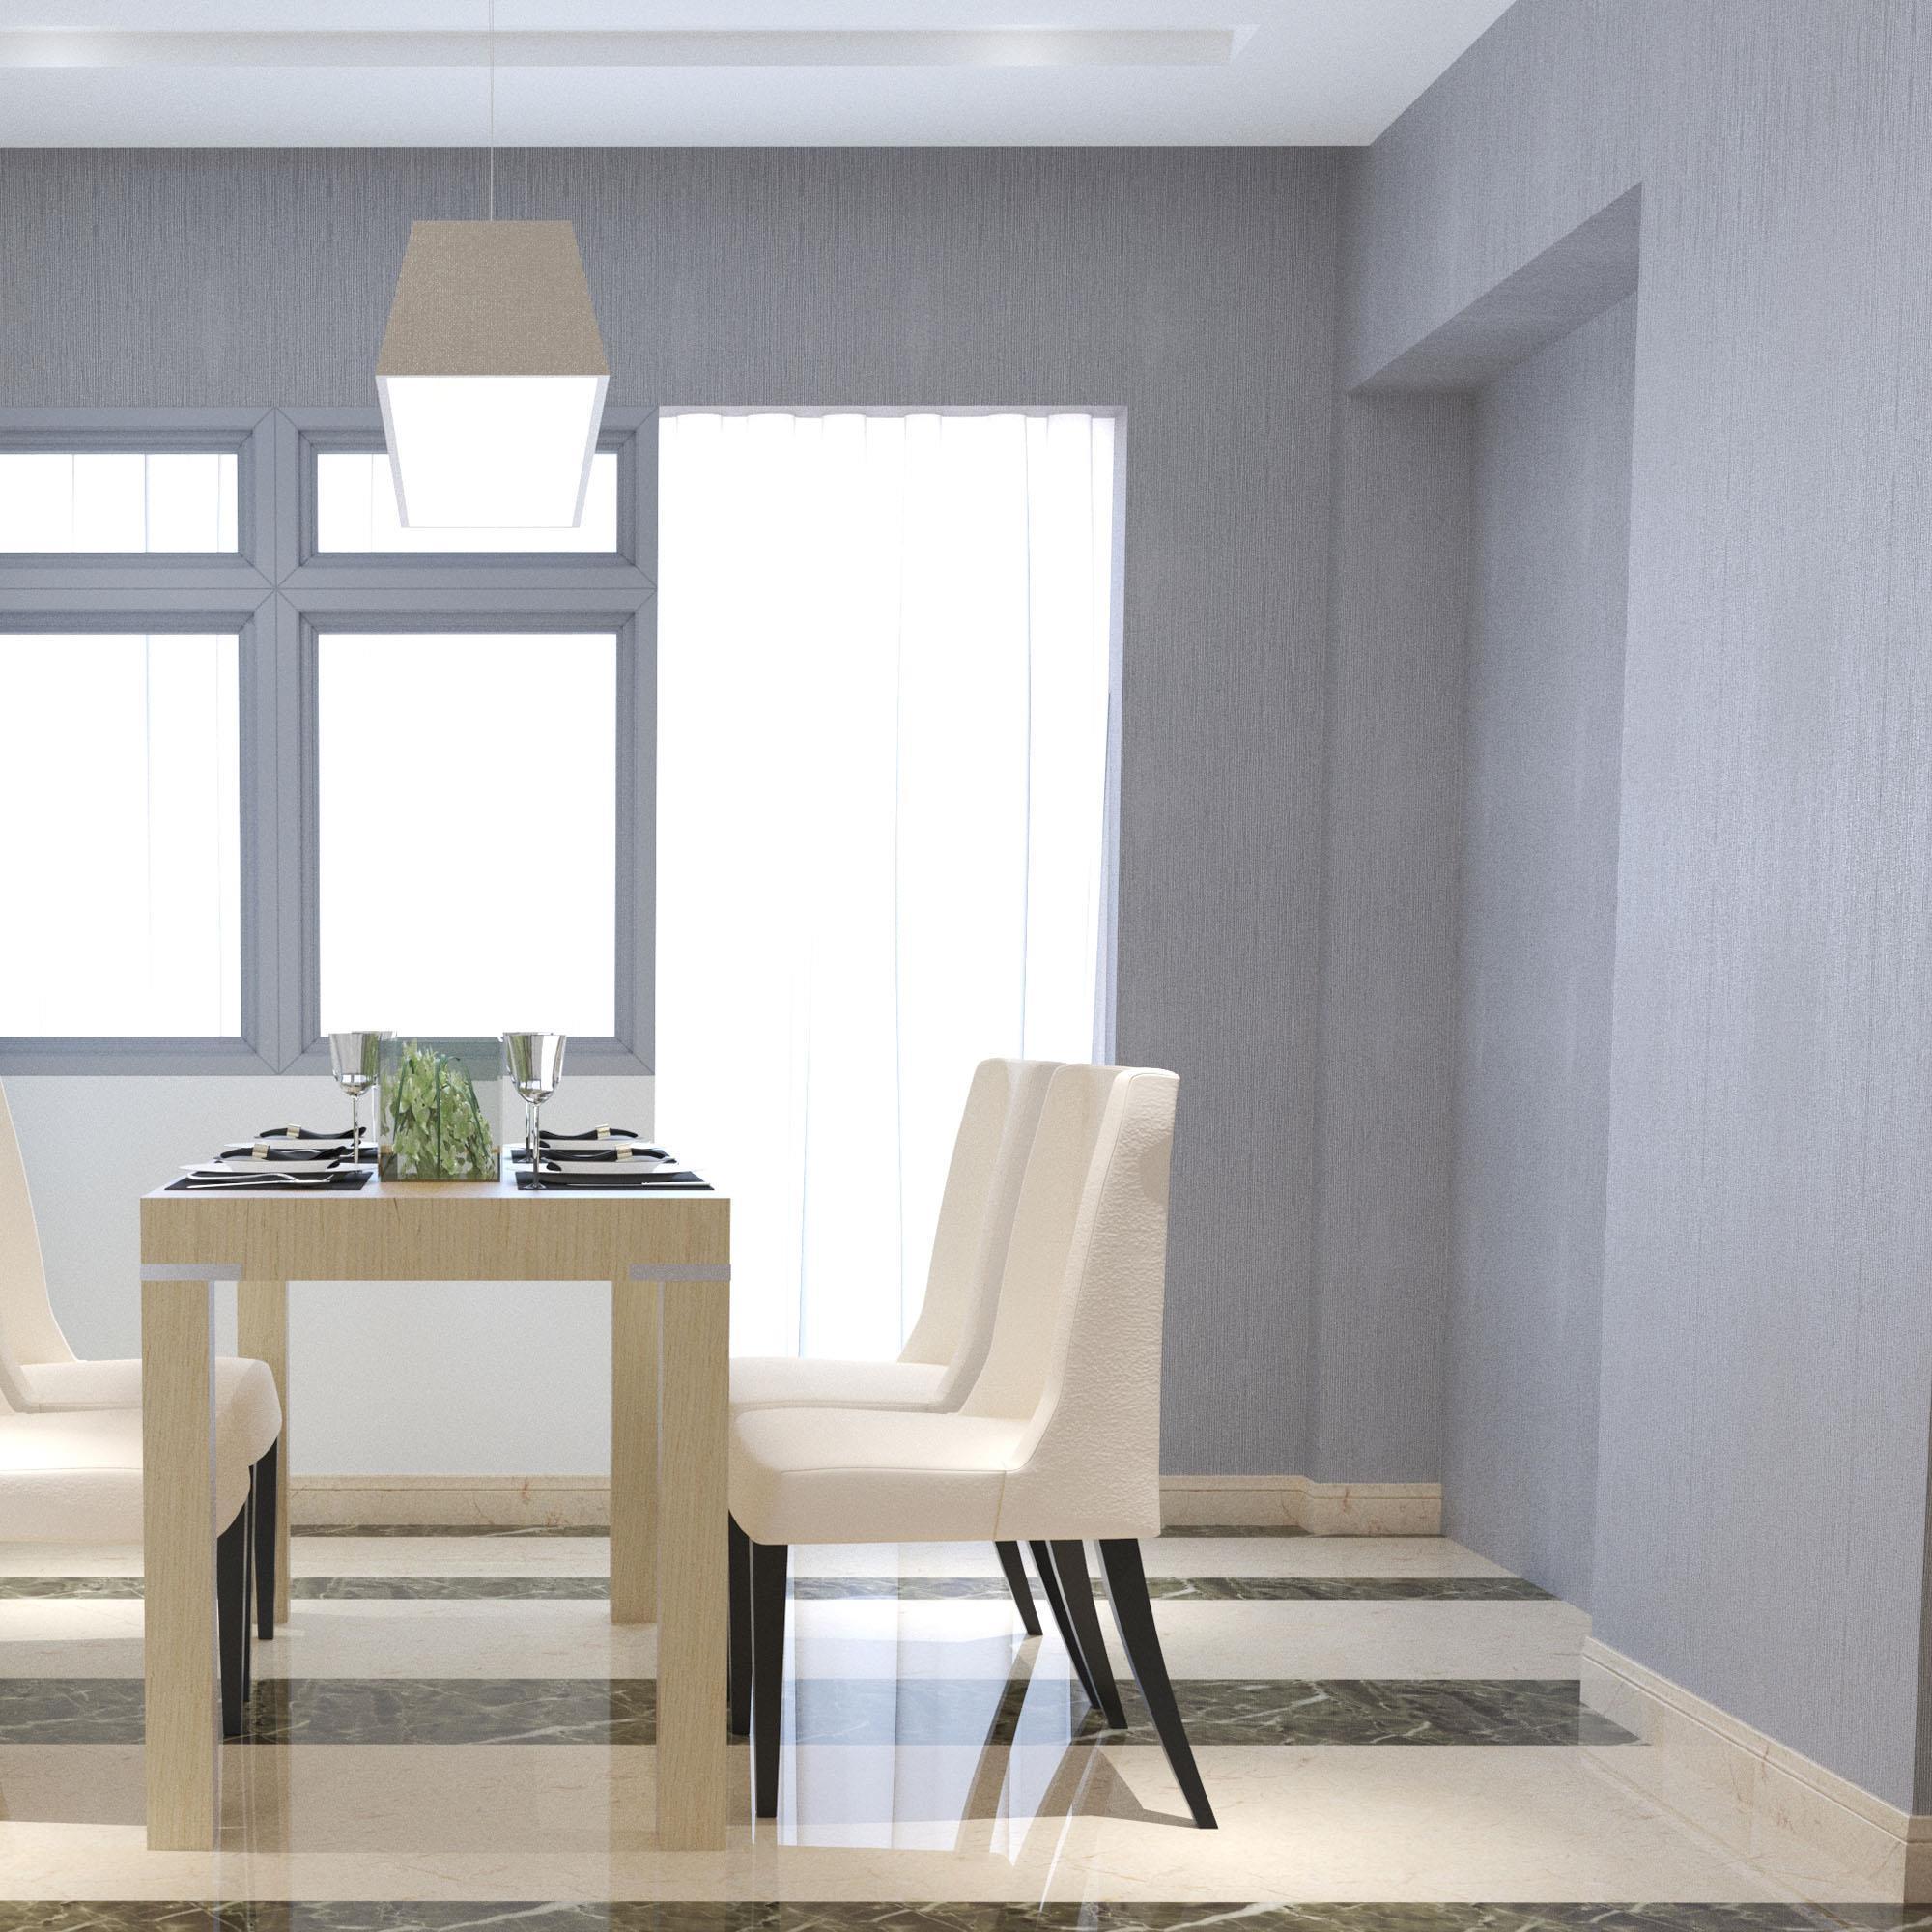 light grey linear bathroom wall panels textured lounge